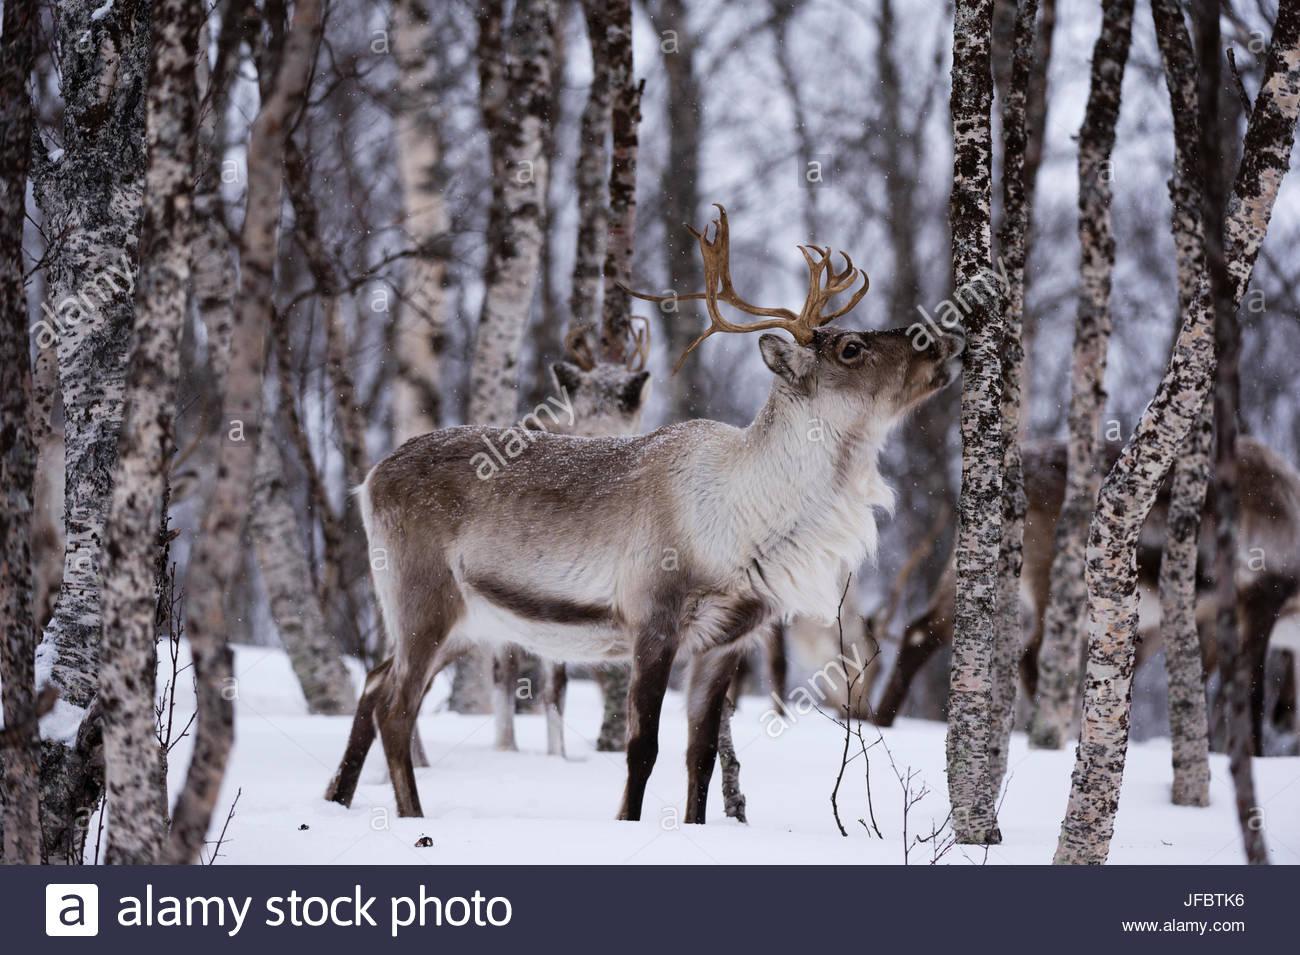 Una renna, Rangifer tarandus, in una foresta innevata. Immagini Stock